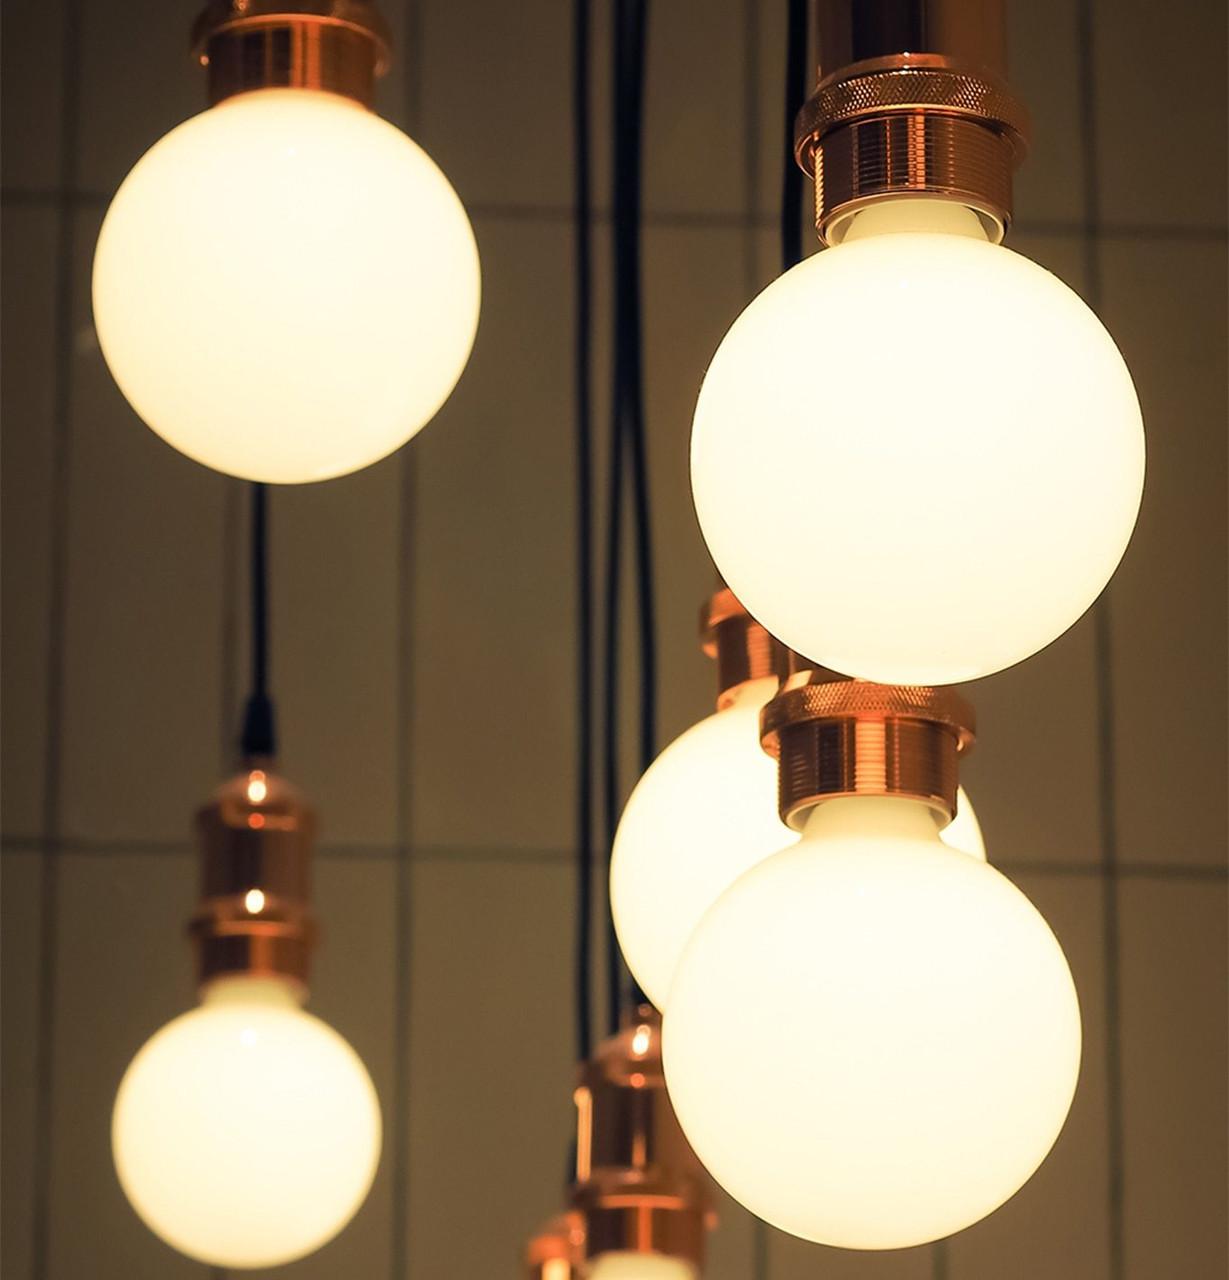 LED Dimmable G80 E27 Light Bulbs